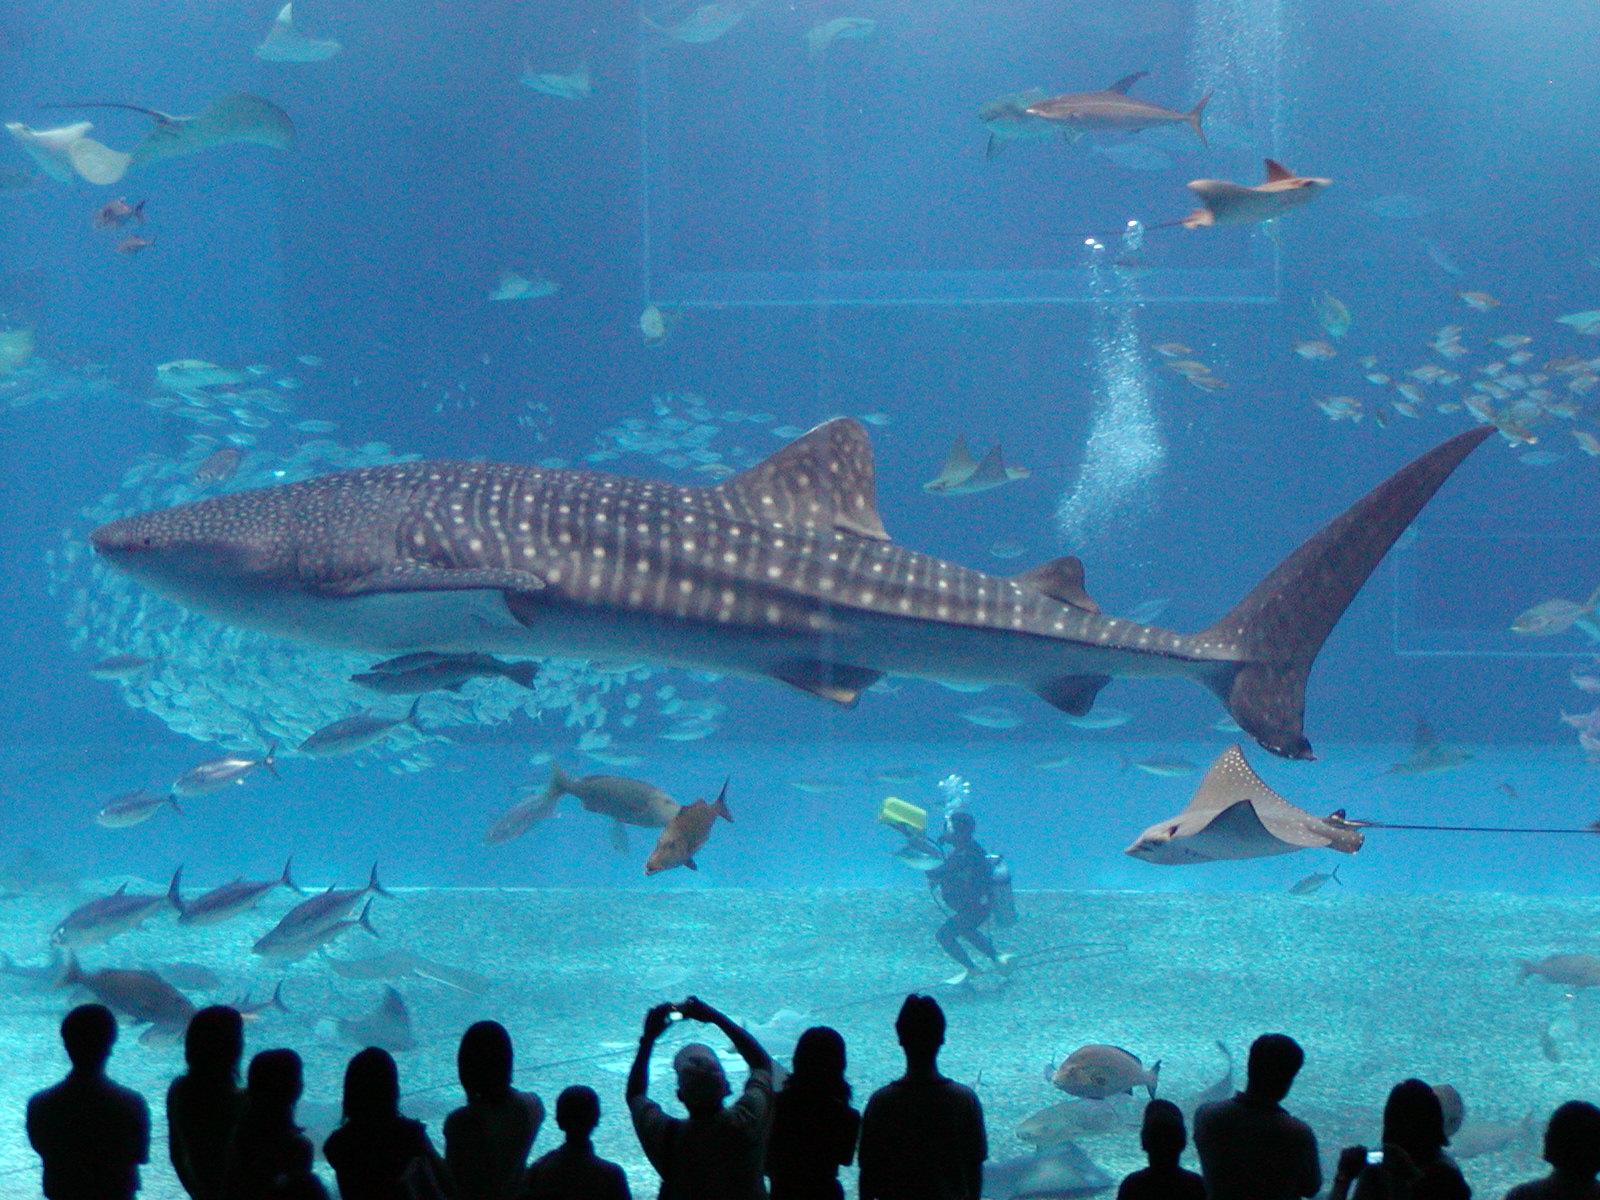 Kumpulan Pertanyaan Umum Yang Sulit Dijawab Mengapa Ikan Kecil Dalam Akuarium Besar Tidak Takut Pada Seekor Hiu Besar